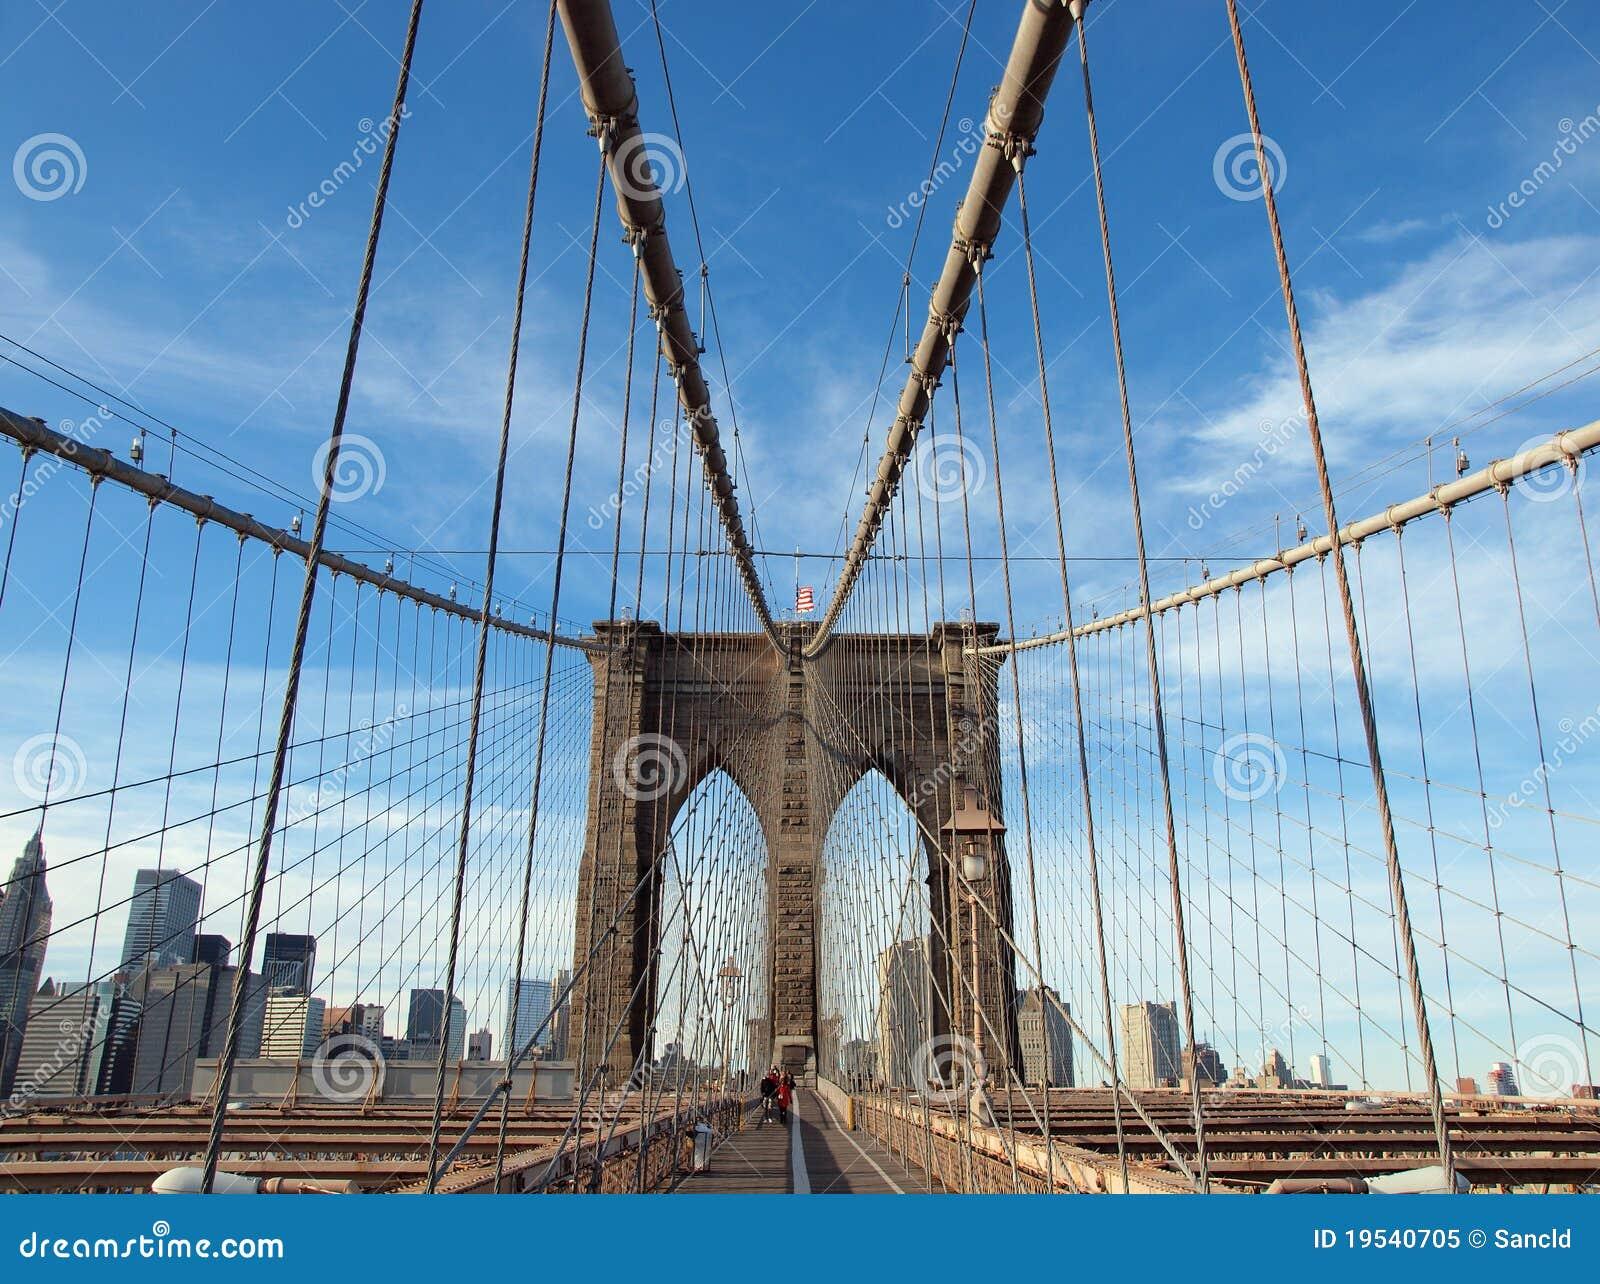 Brooklyn-Brücke, USA, Markierungsfahne, Fußgänger, Gehweg